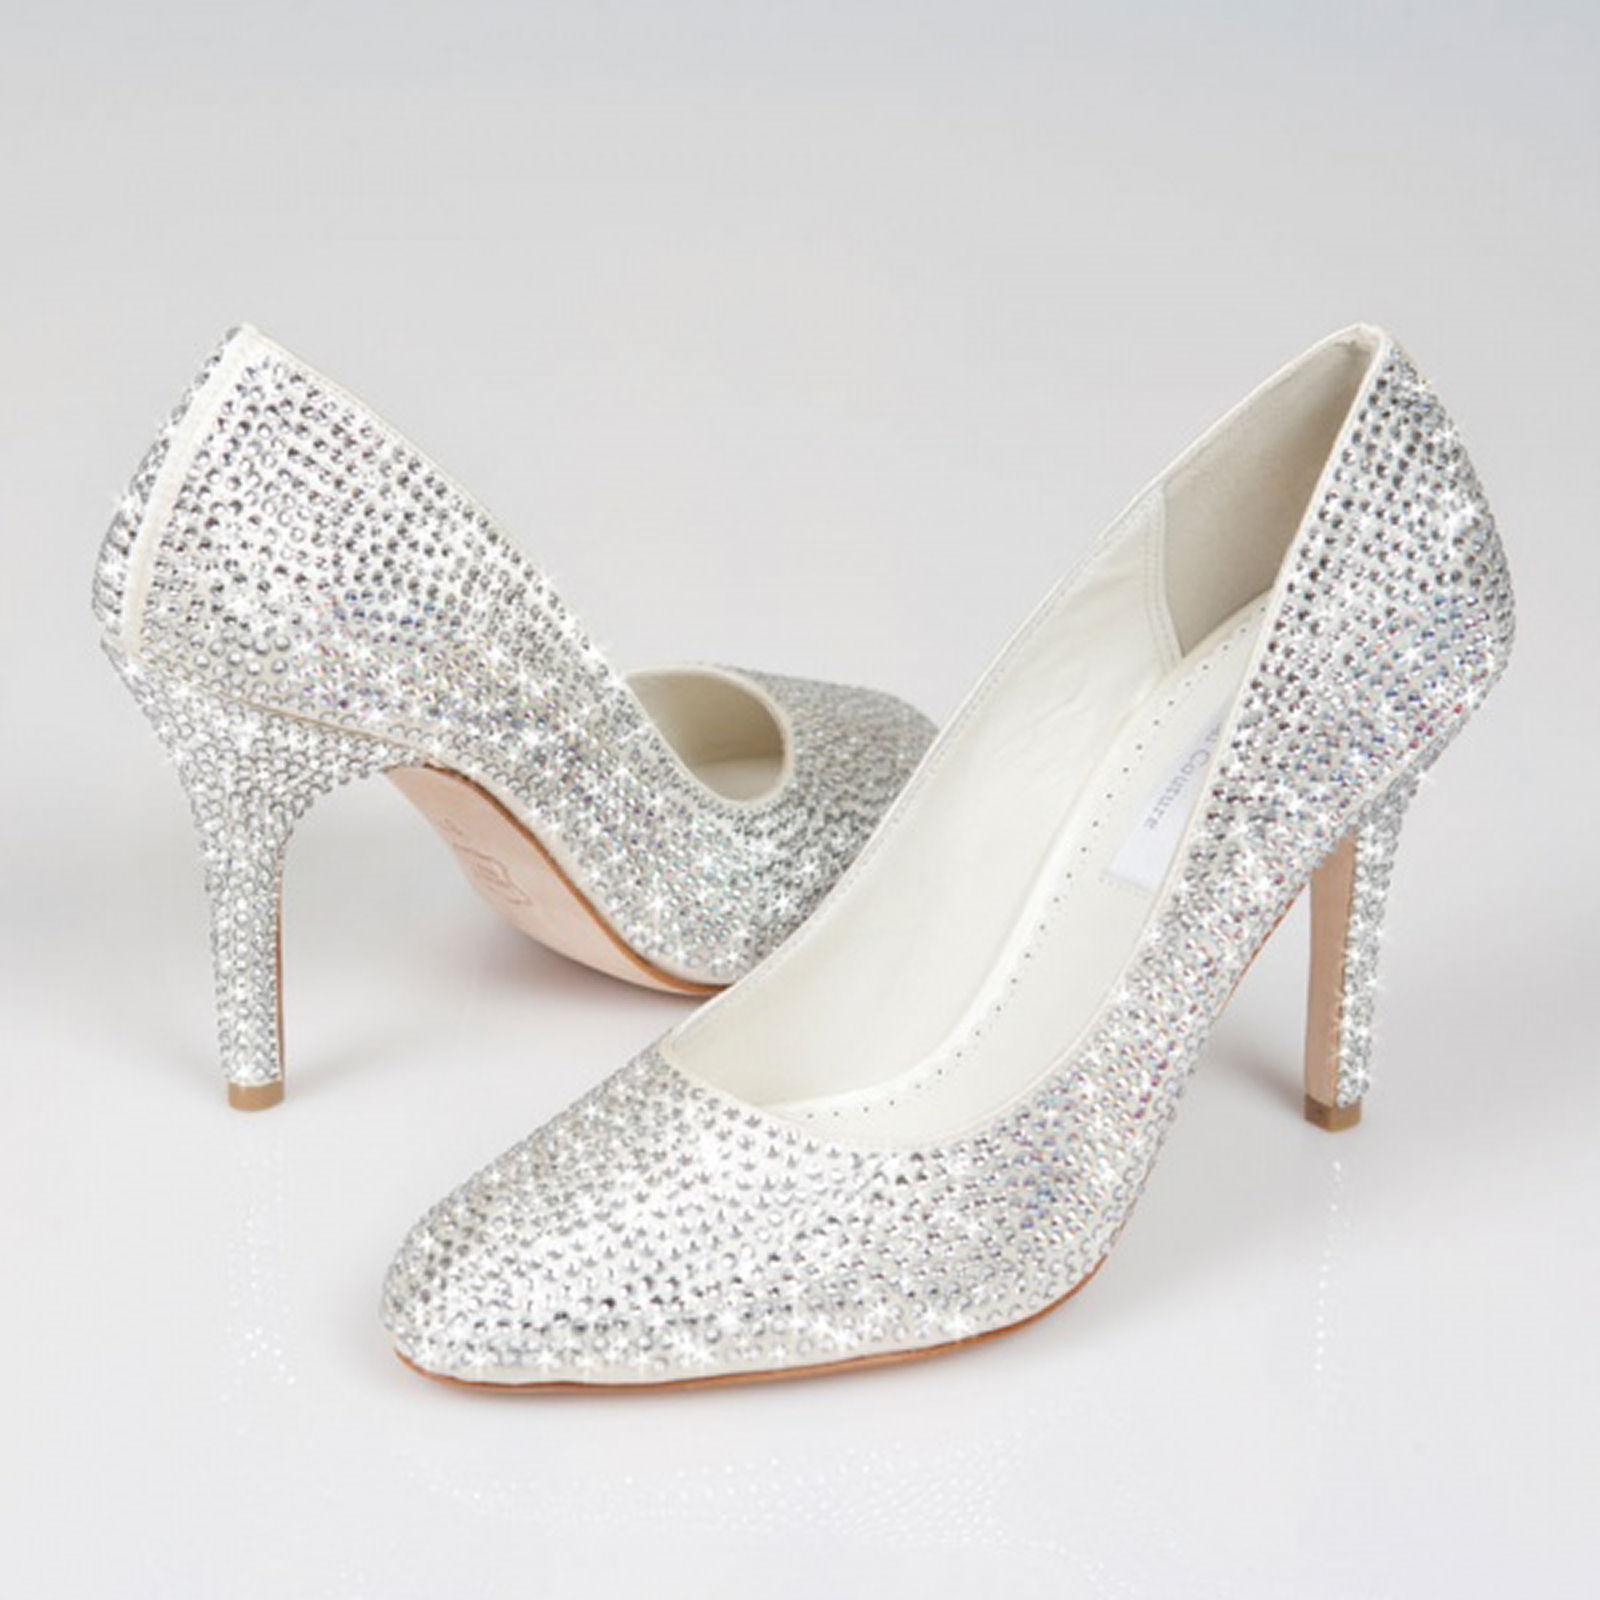 Crystal Heels Wedding Shoes Florida Photo Magazine Com